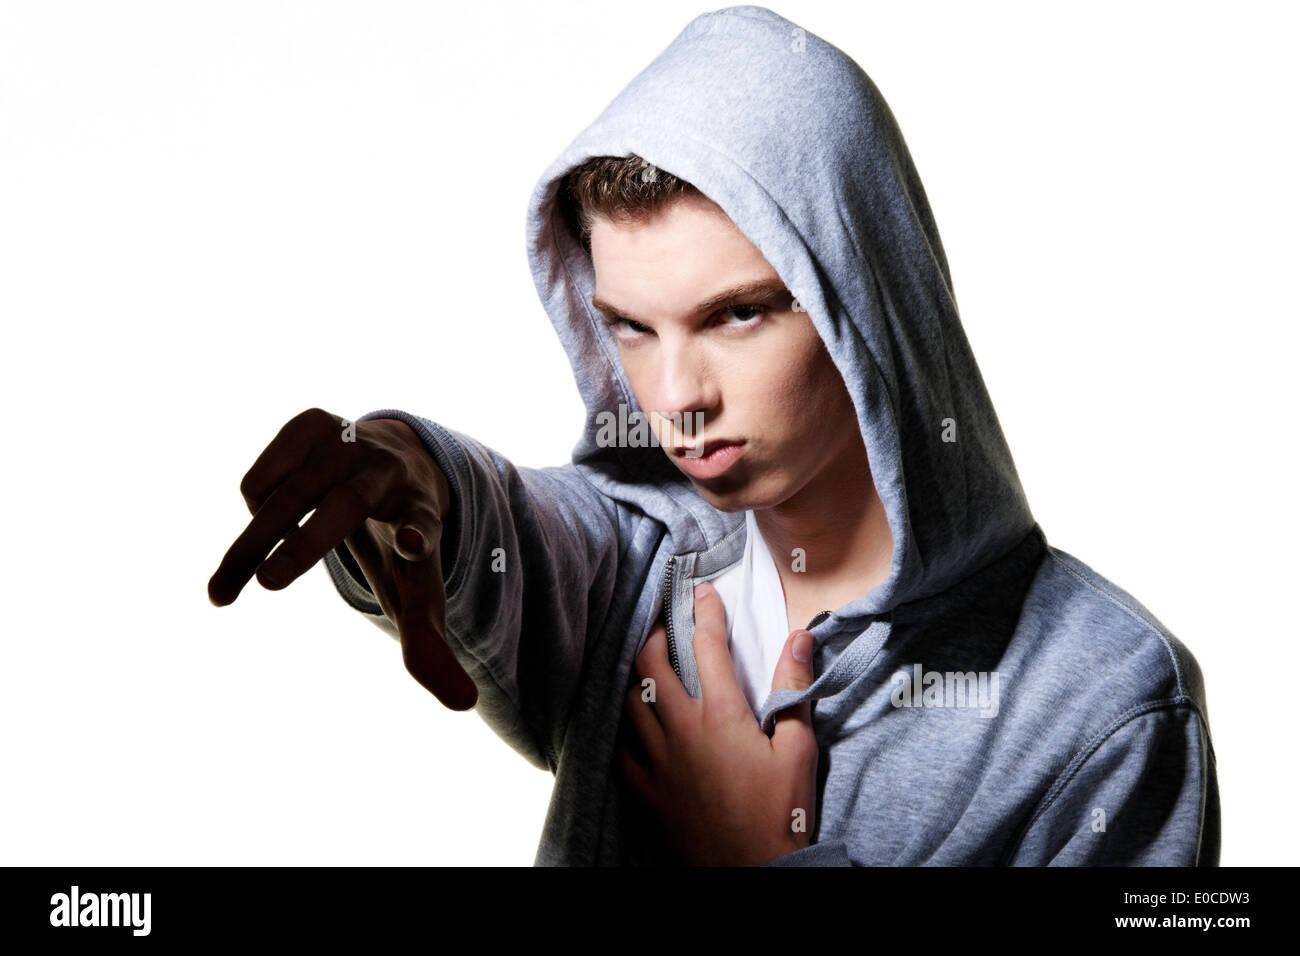 A cool looking youthful man with bonnet, Ein cool blickender Jugendlicher Mann mit Haube Stock Photo